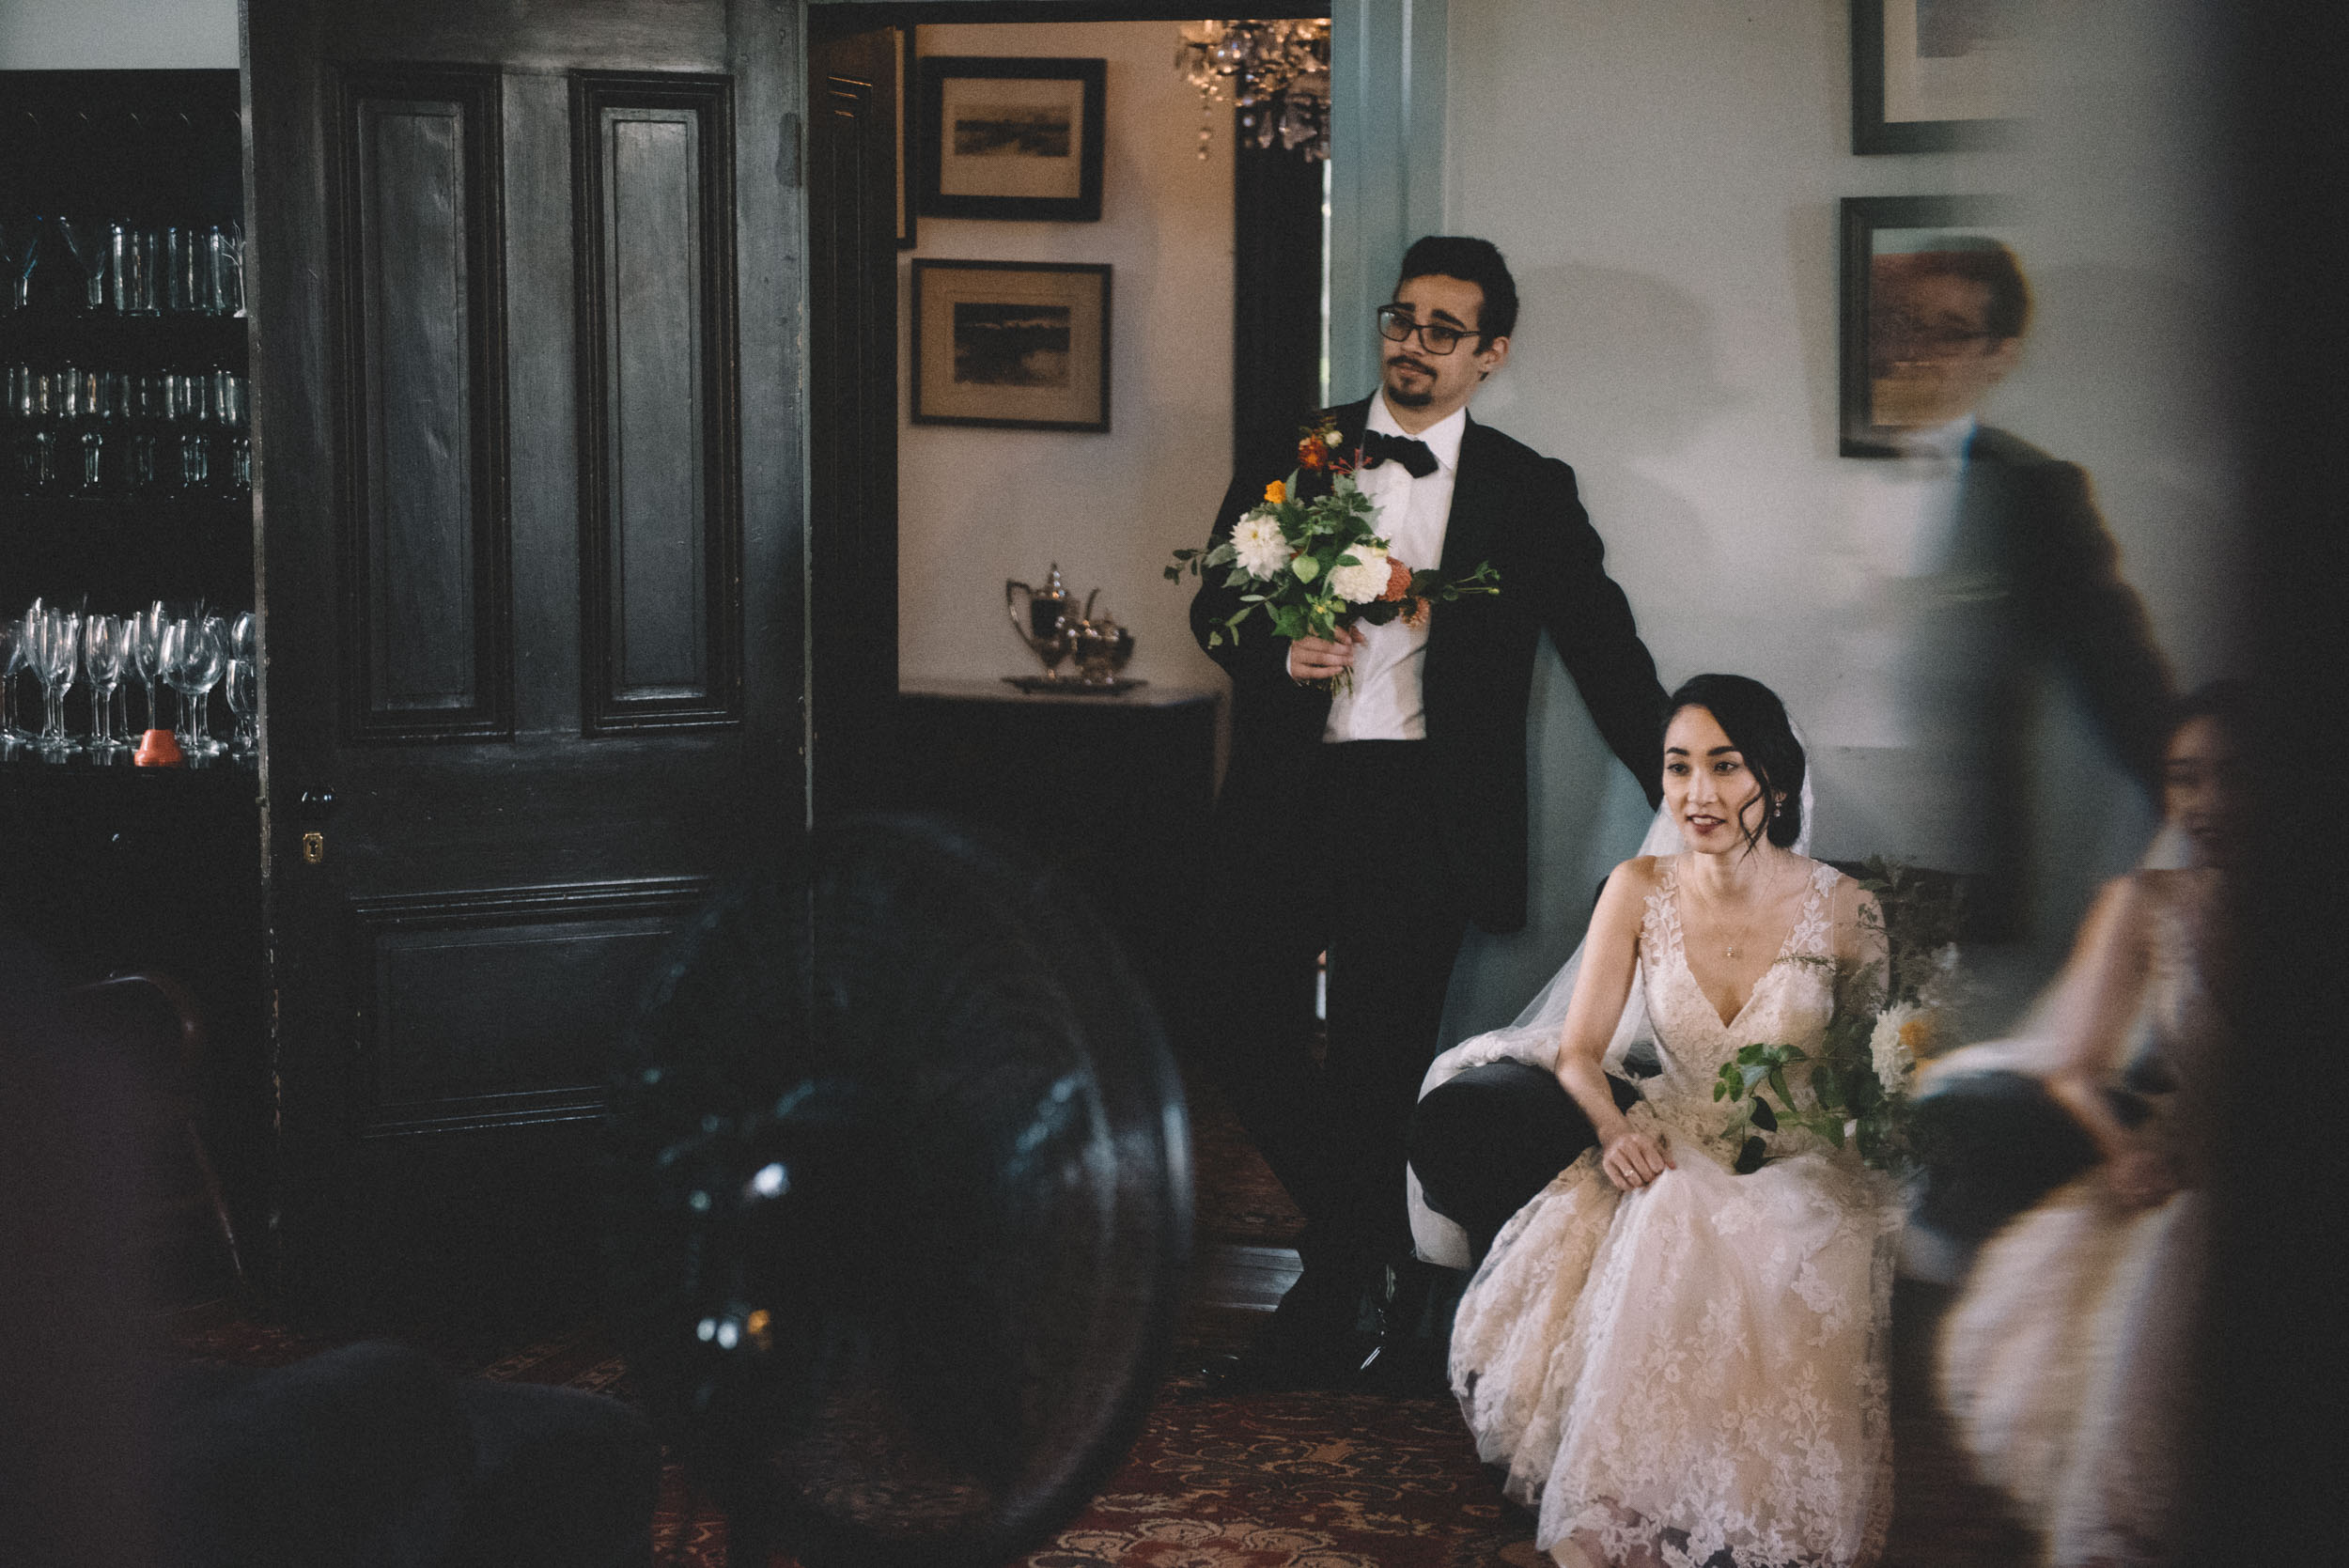 poolseville-maryland-wedding-photographer-29.jpg